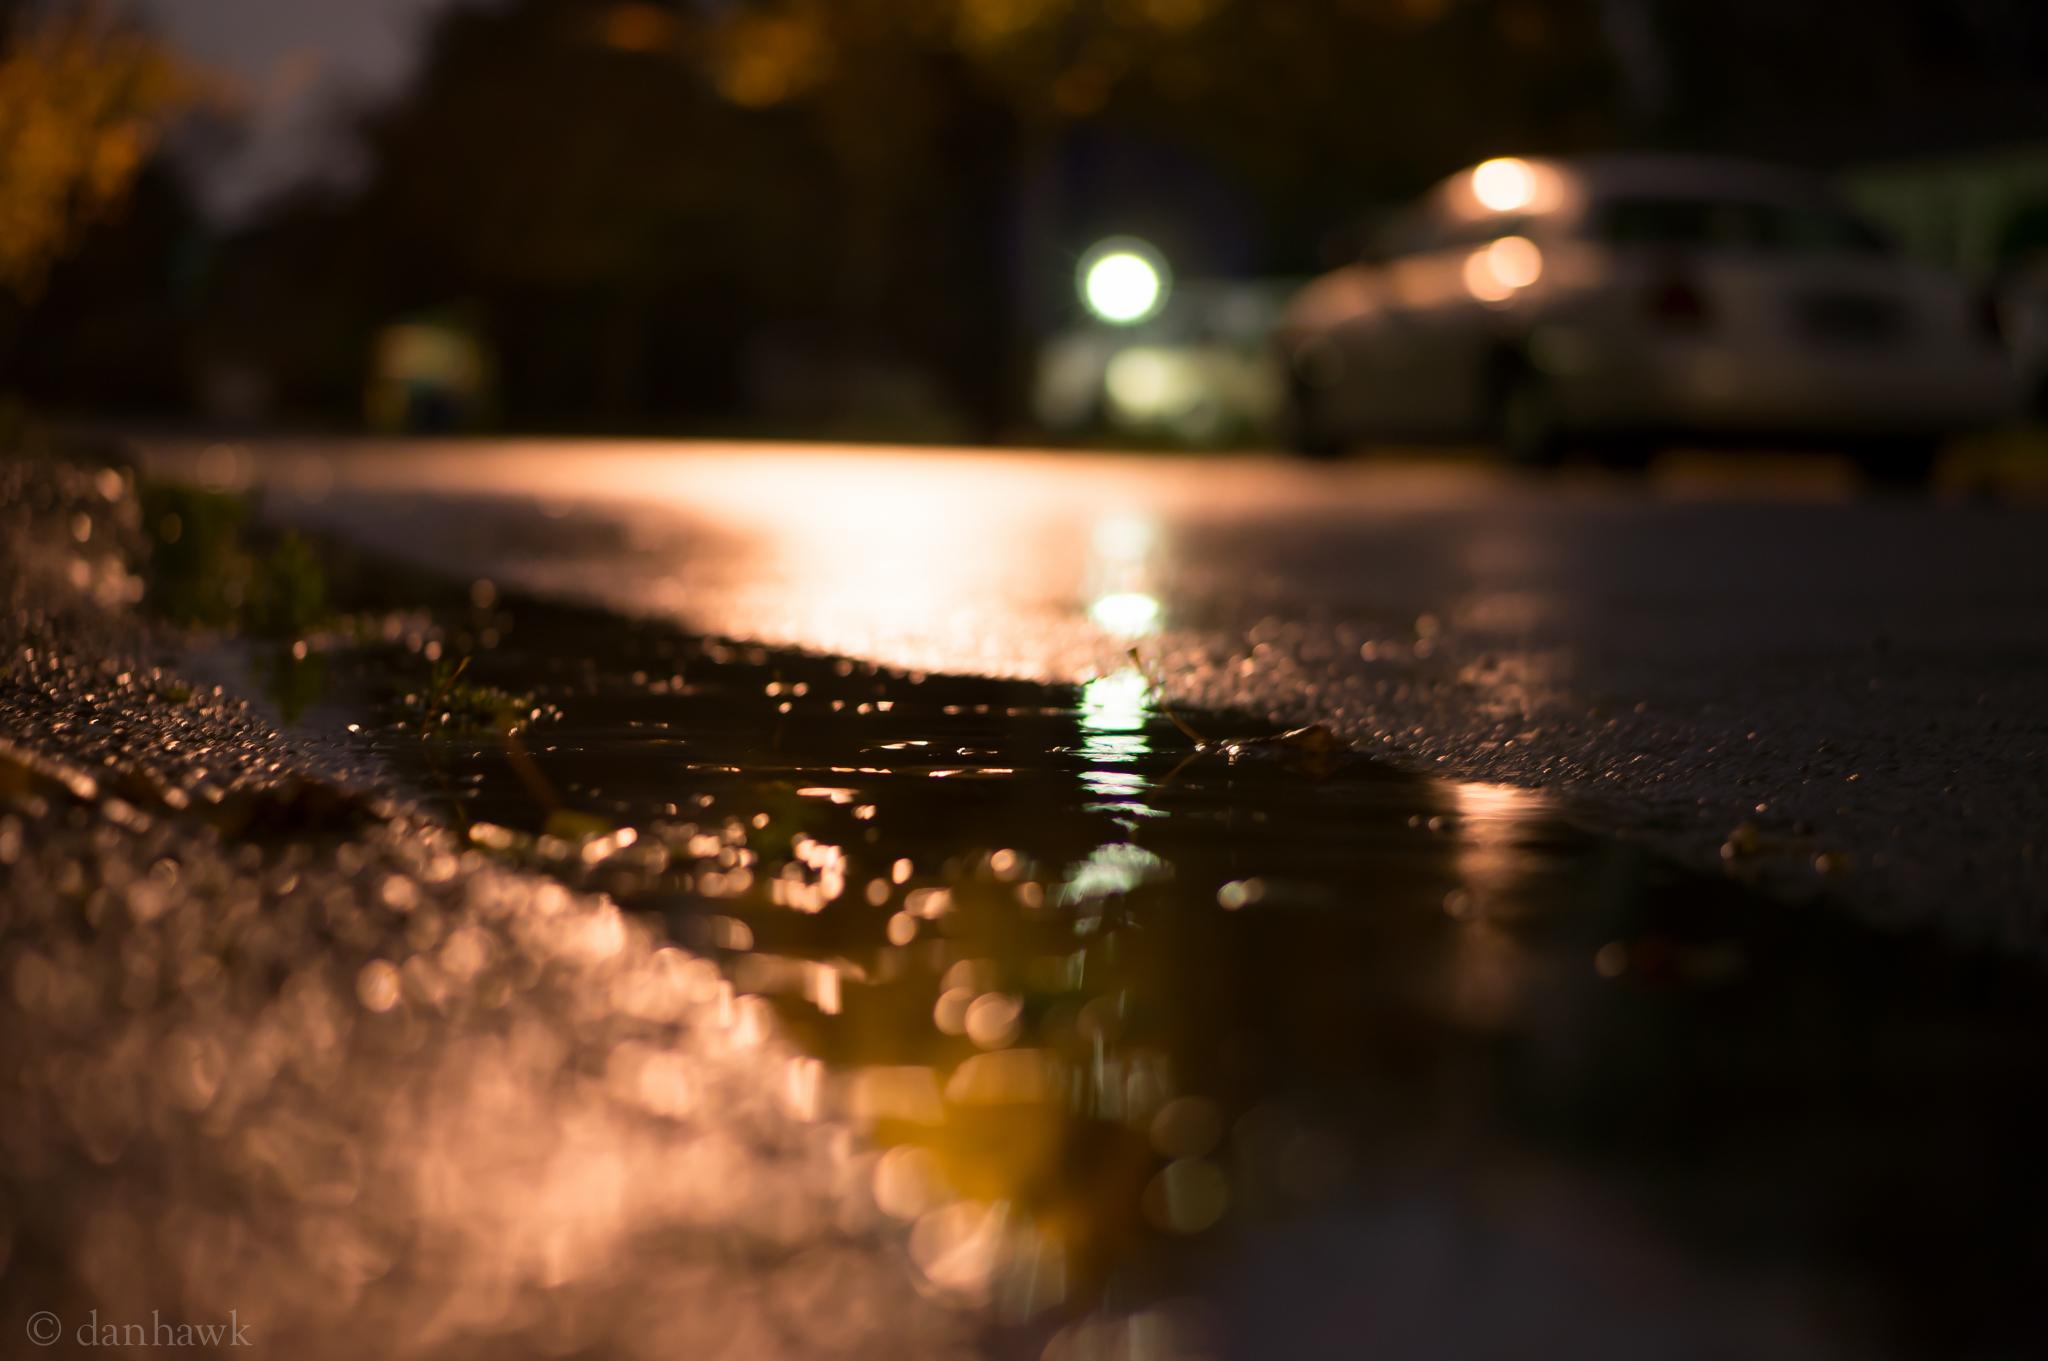 Rainy Night | 365 Project | Oct. 28th, 2012